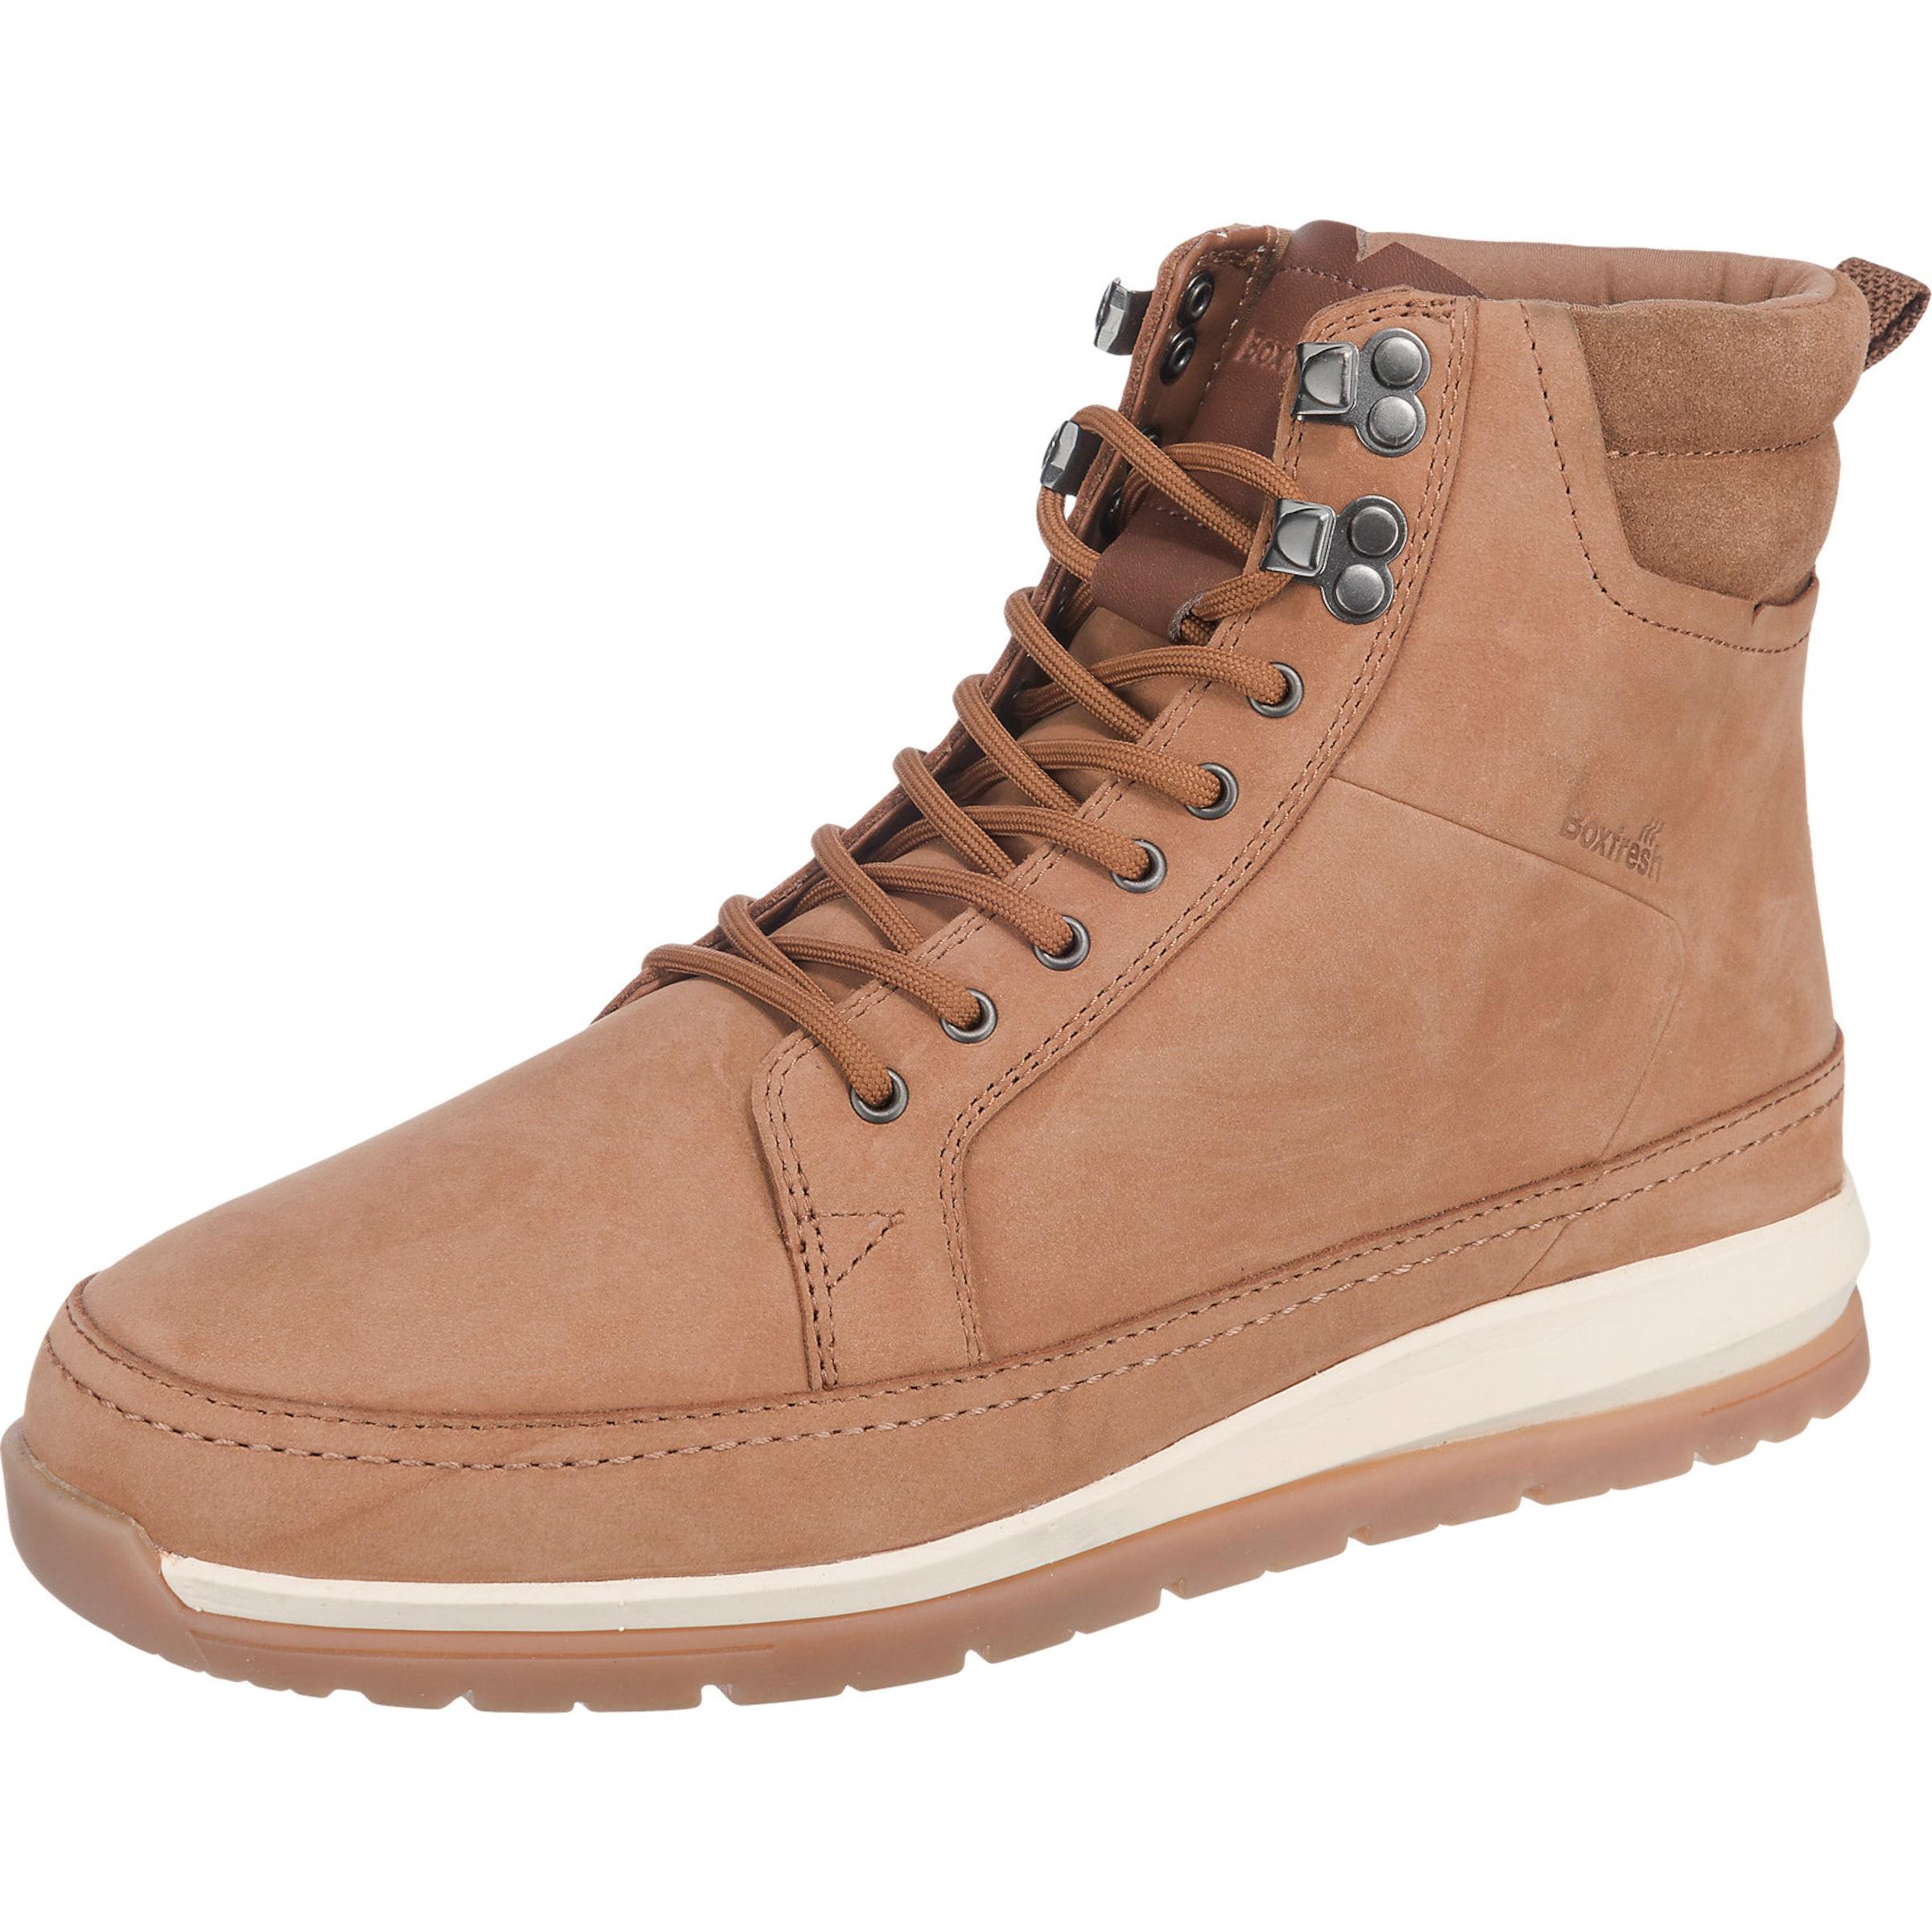 BOXFRESH Loadha Sneakers Günstige und langlebige Schuhe